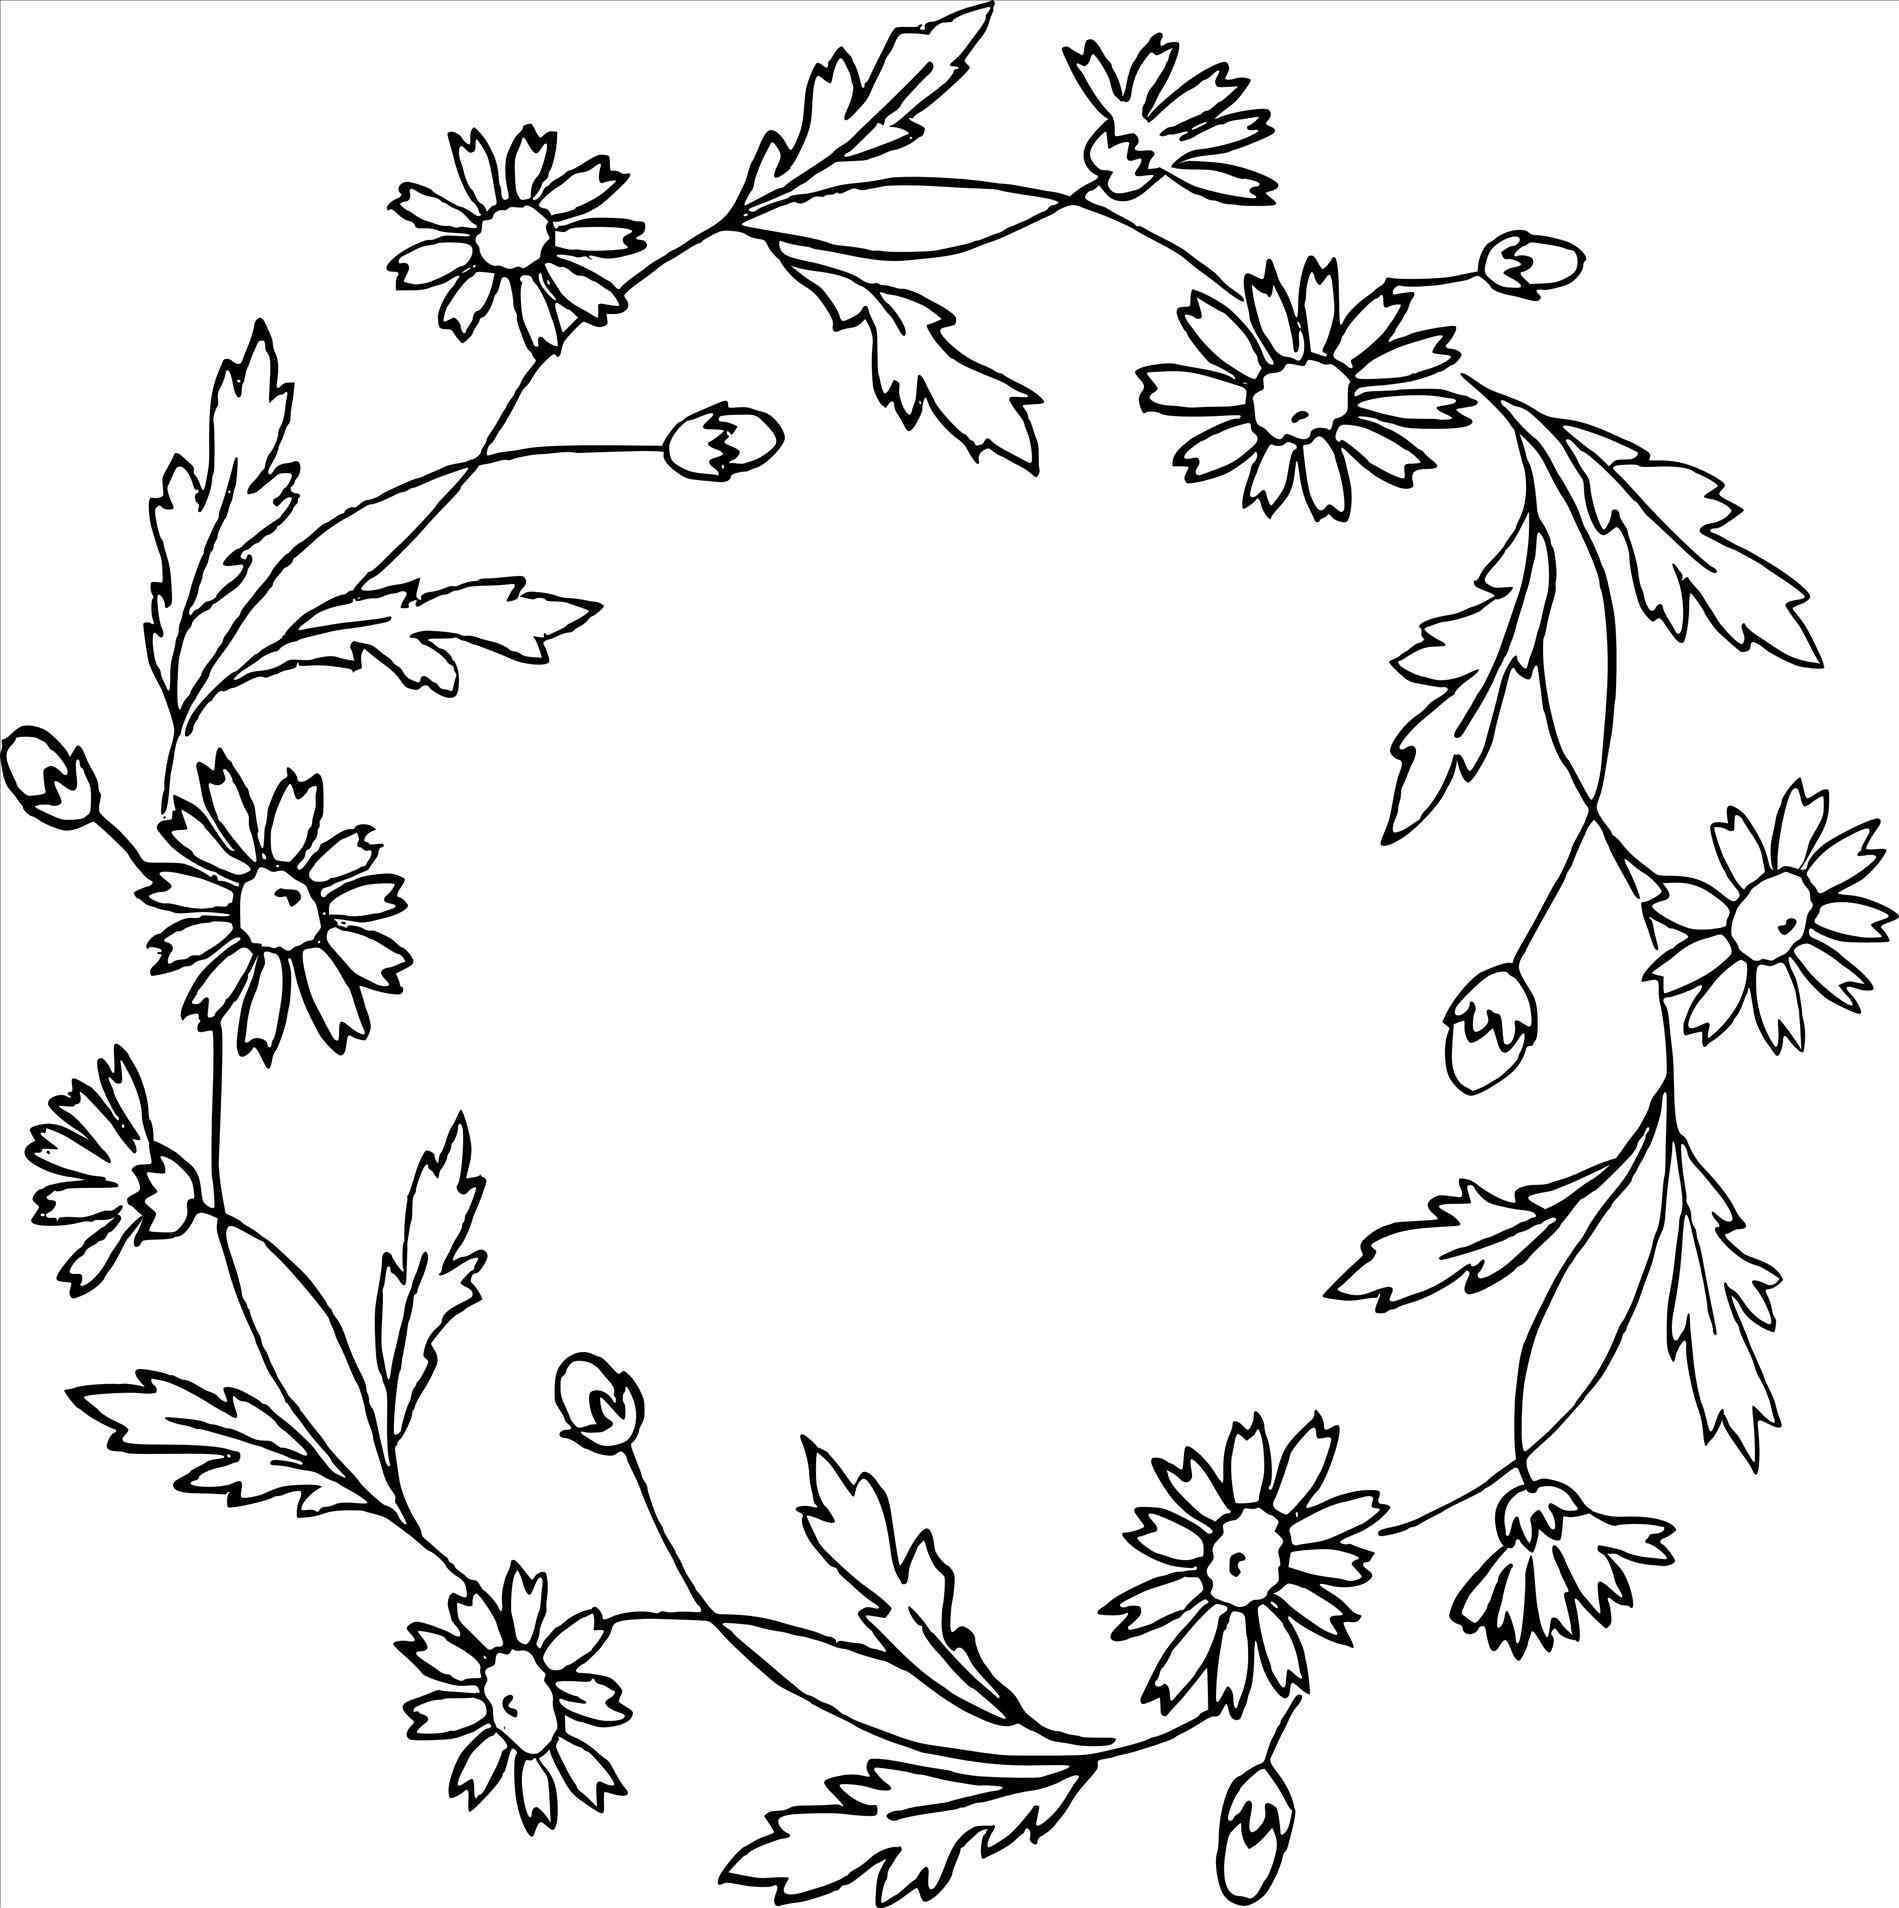 1899x1908 Drawings Tumblr Of Drawing Art Dandelion Sketch U Pinteresu